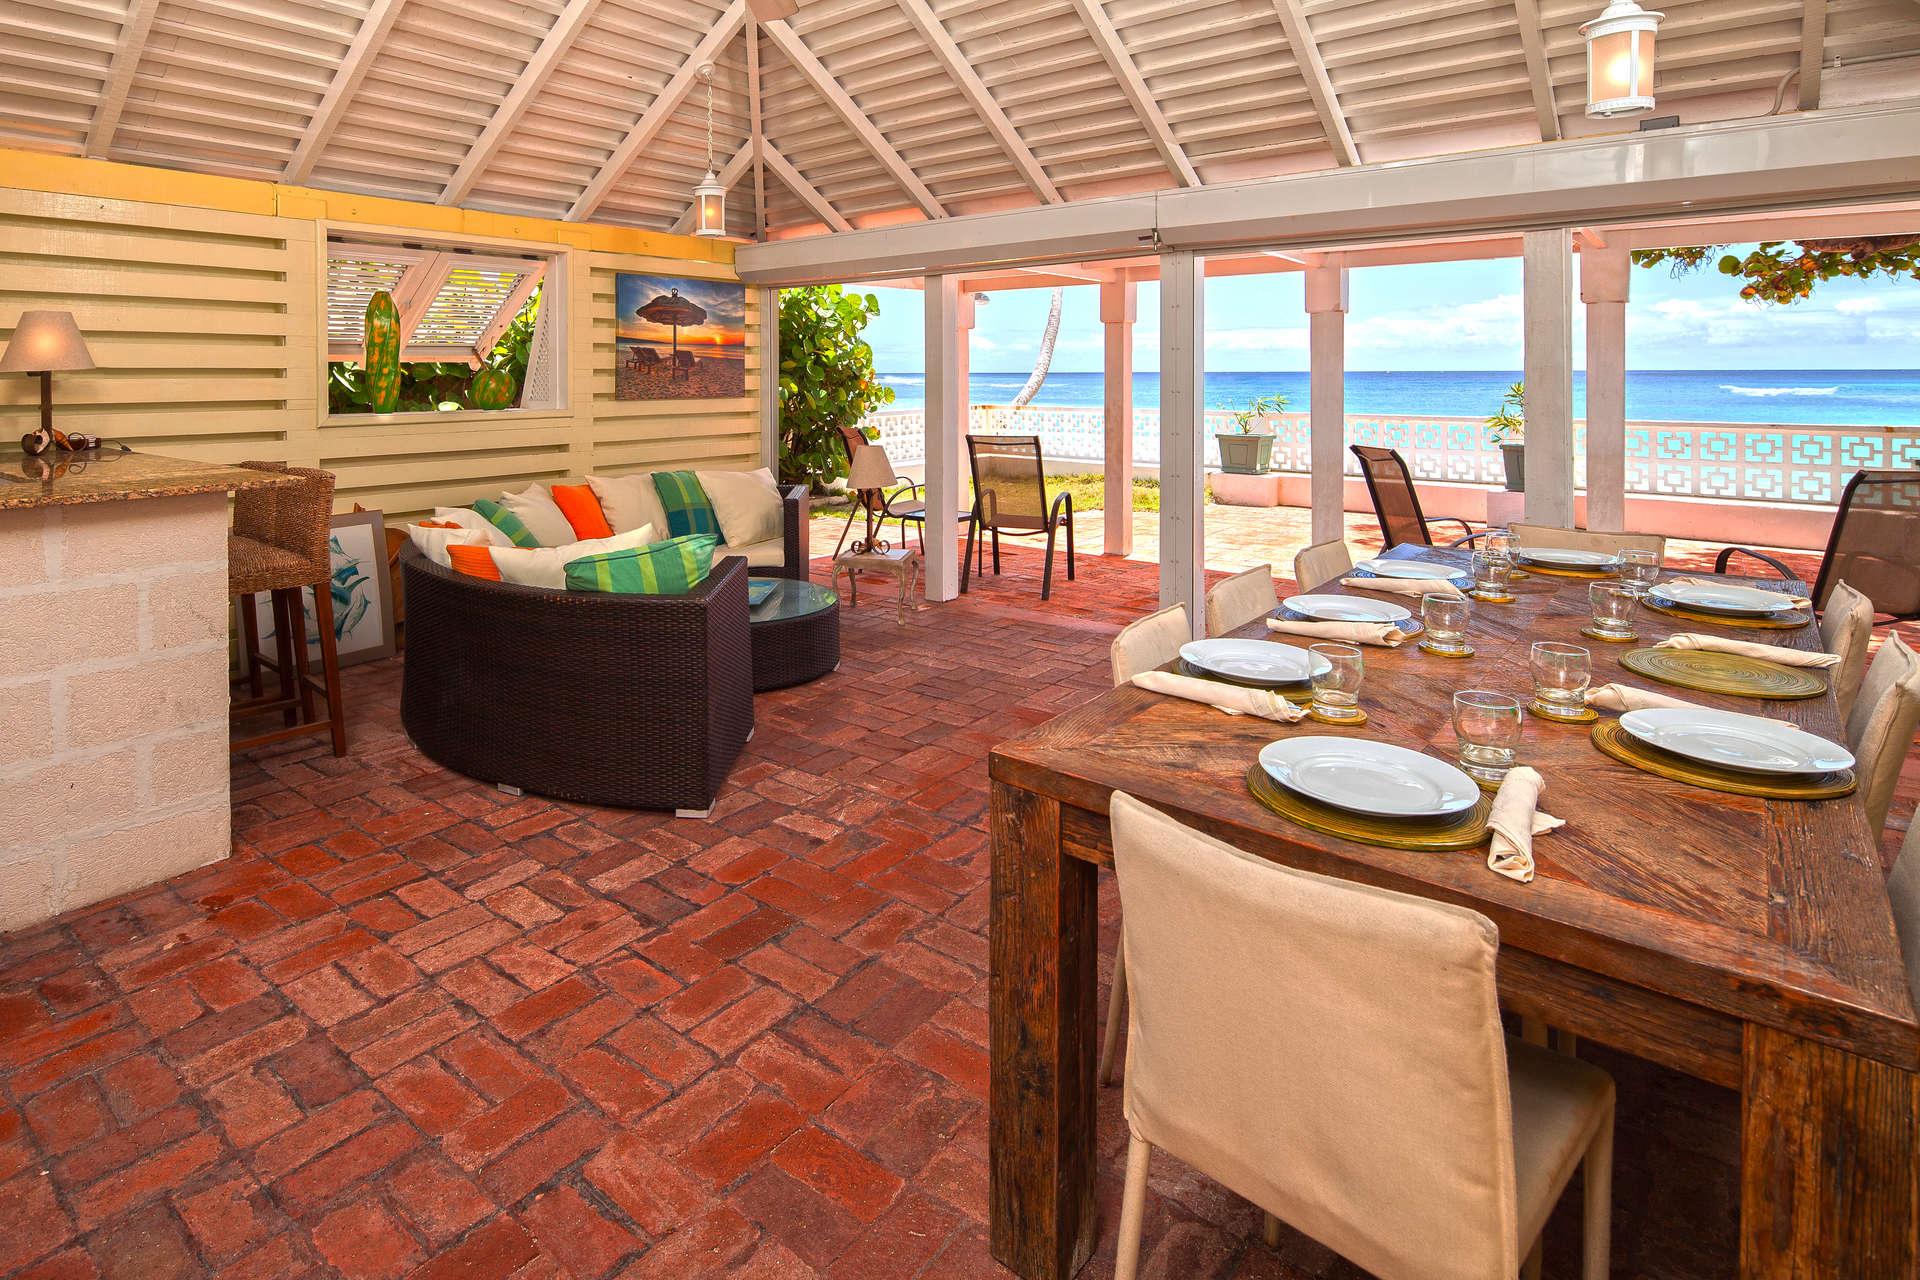 Luxury villa rentals caribbean - Barbados - Christ church - Worthing beach - Arcadia - Image 1/12